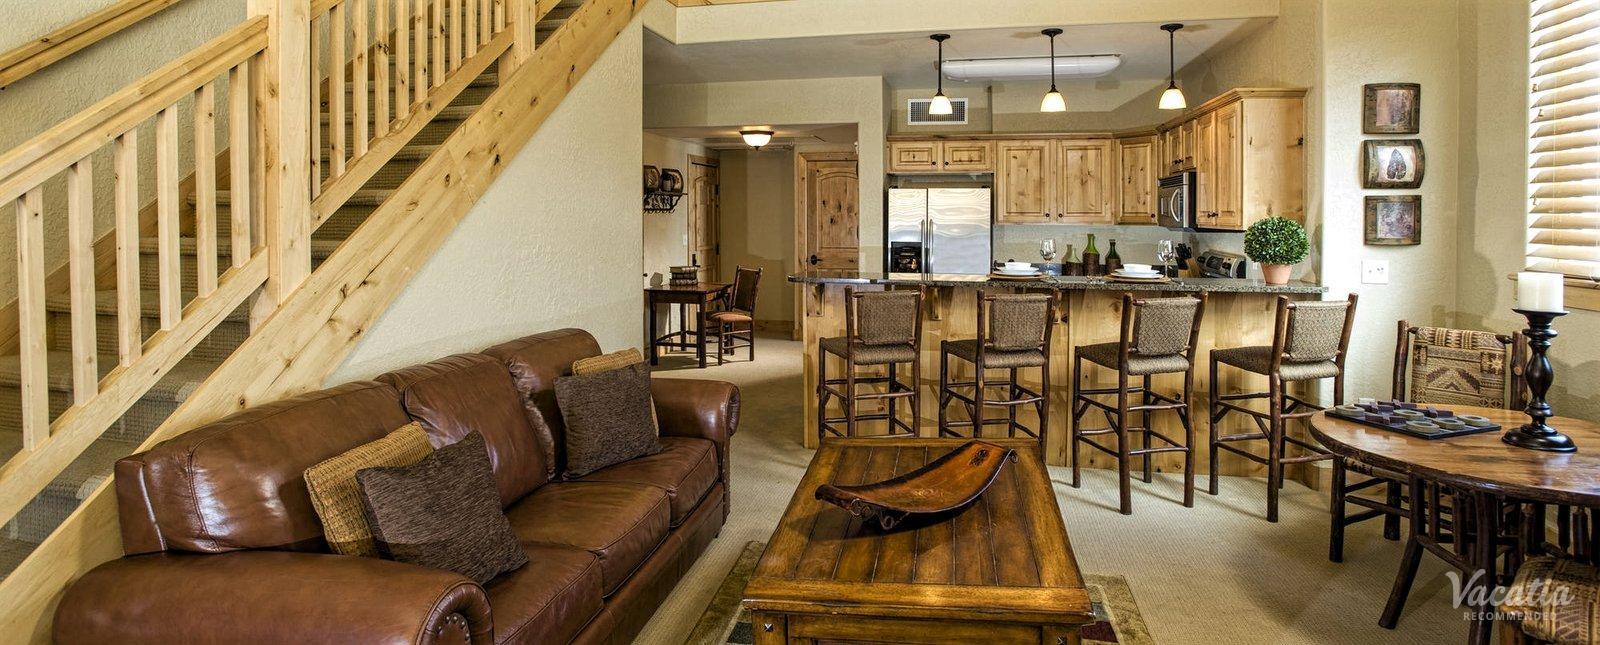 Silverado Lodge - Park City - Canyons Village | Vacatia